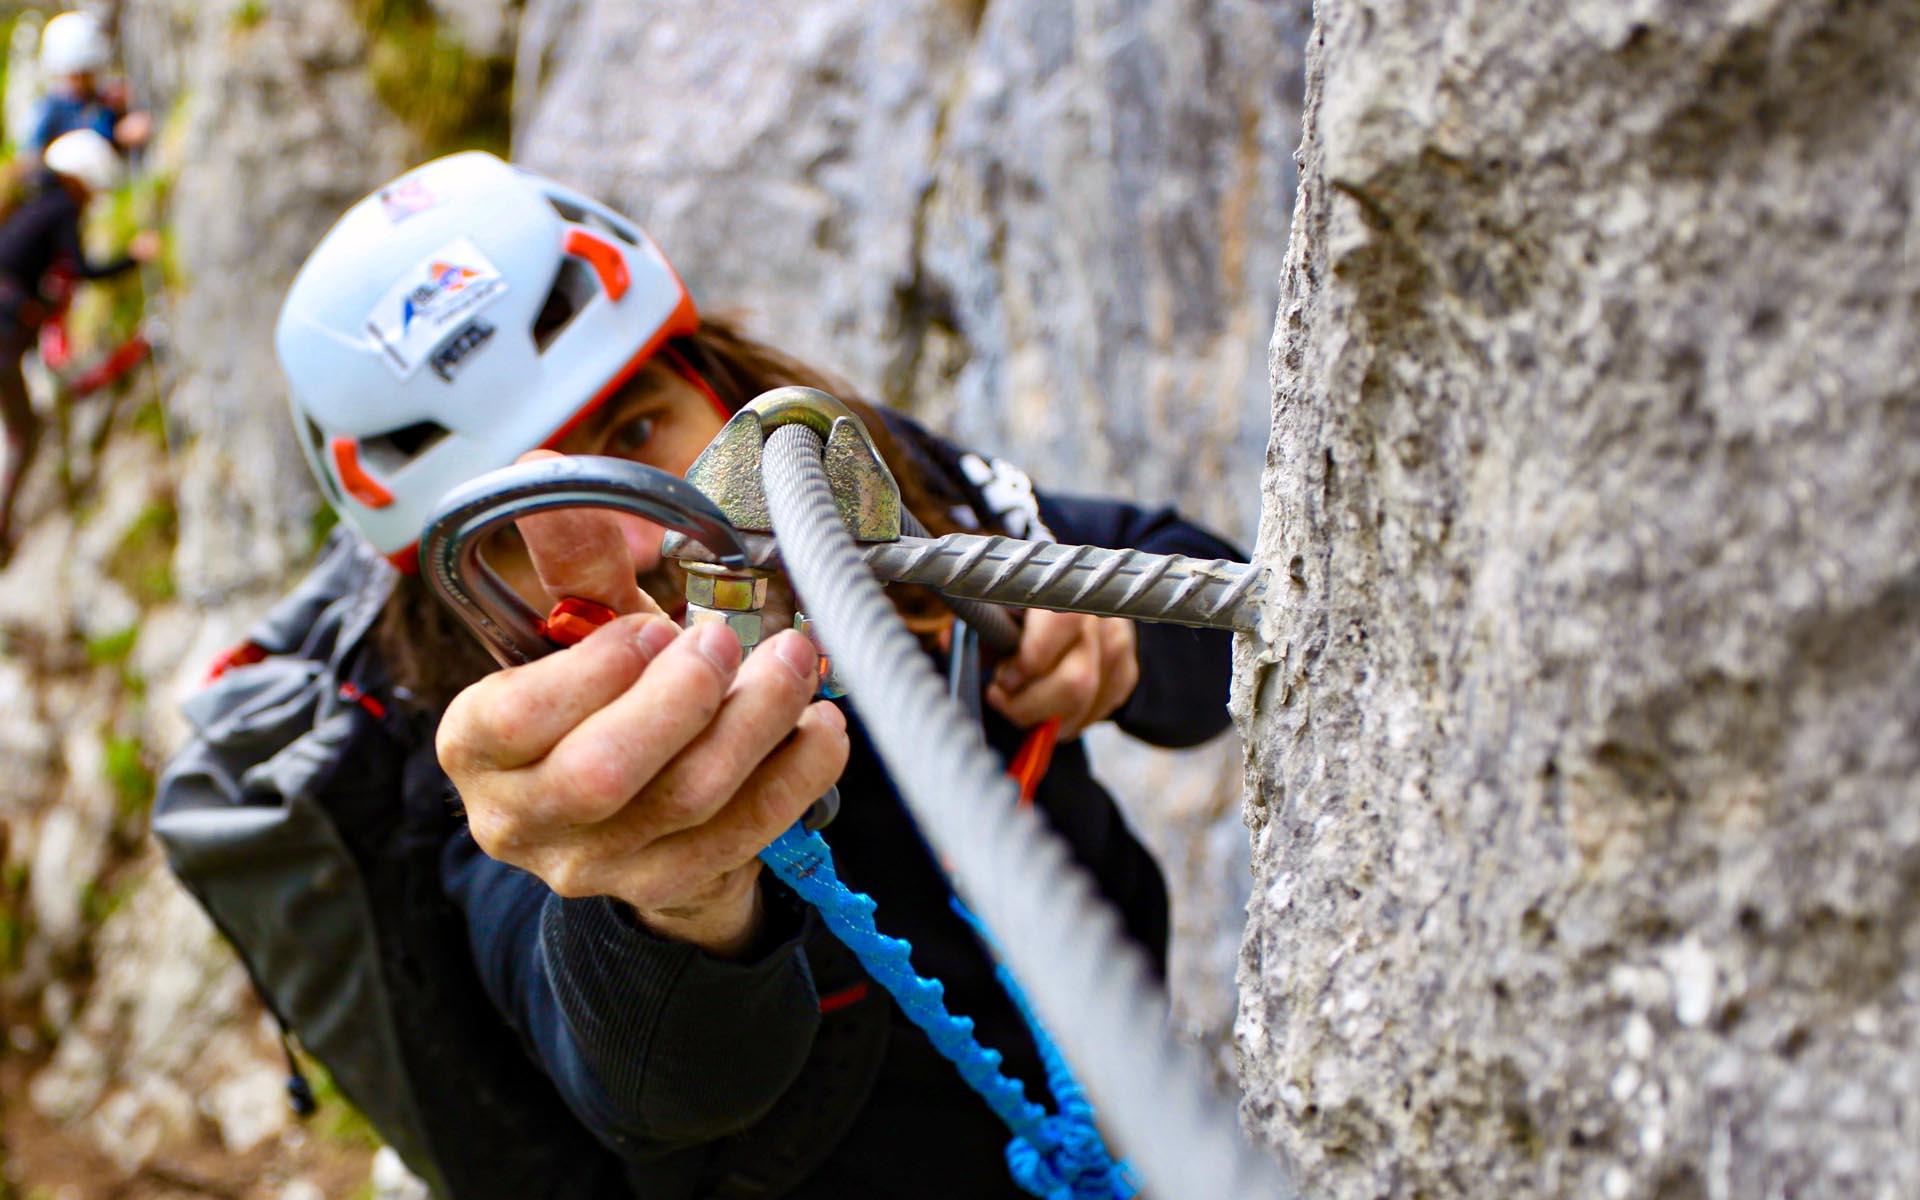 Klettersteigset Verleih Salzburg : Klettersteigschule: klettersteigschule klettersteigkurs